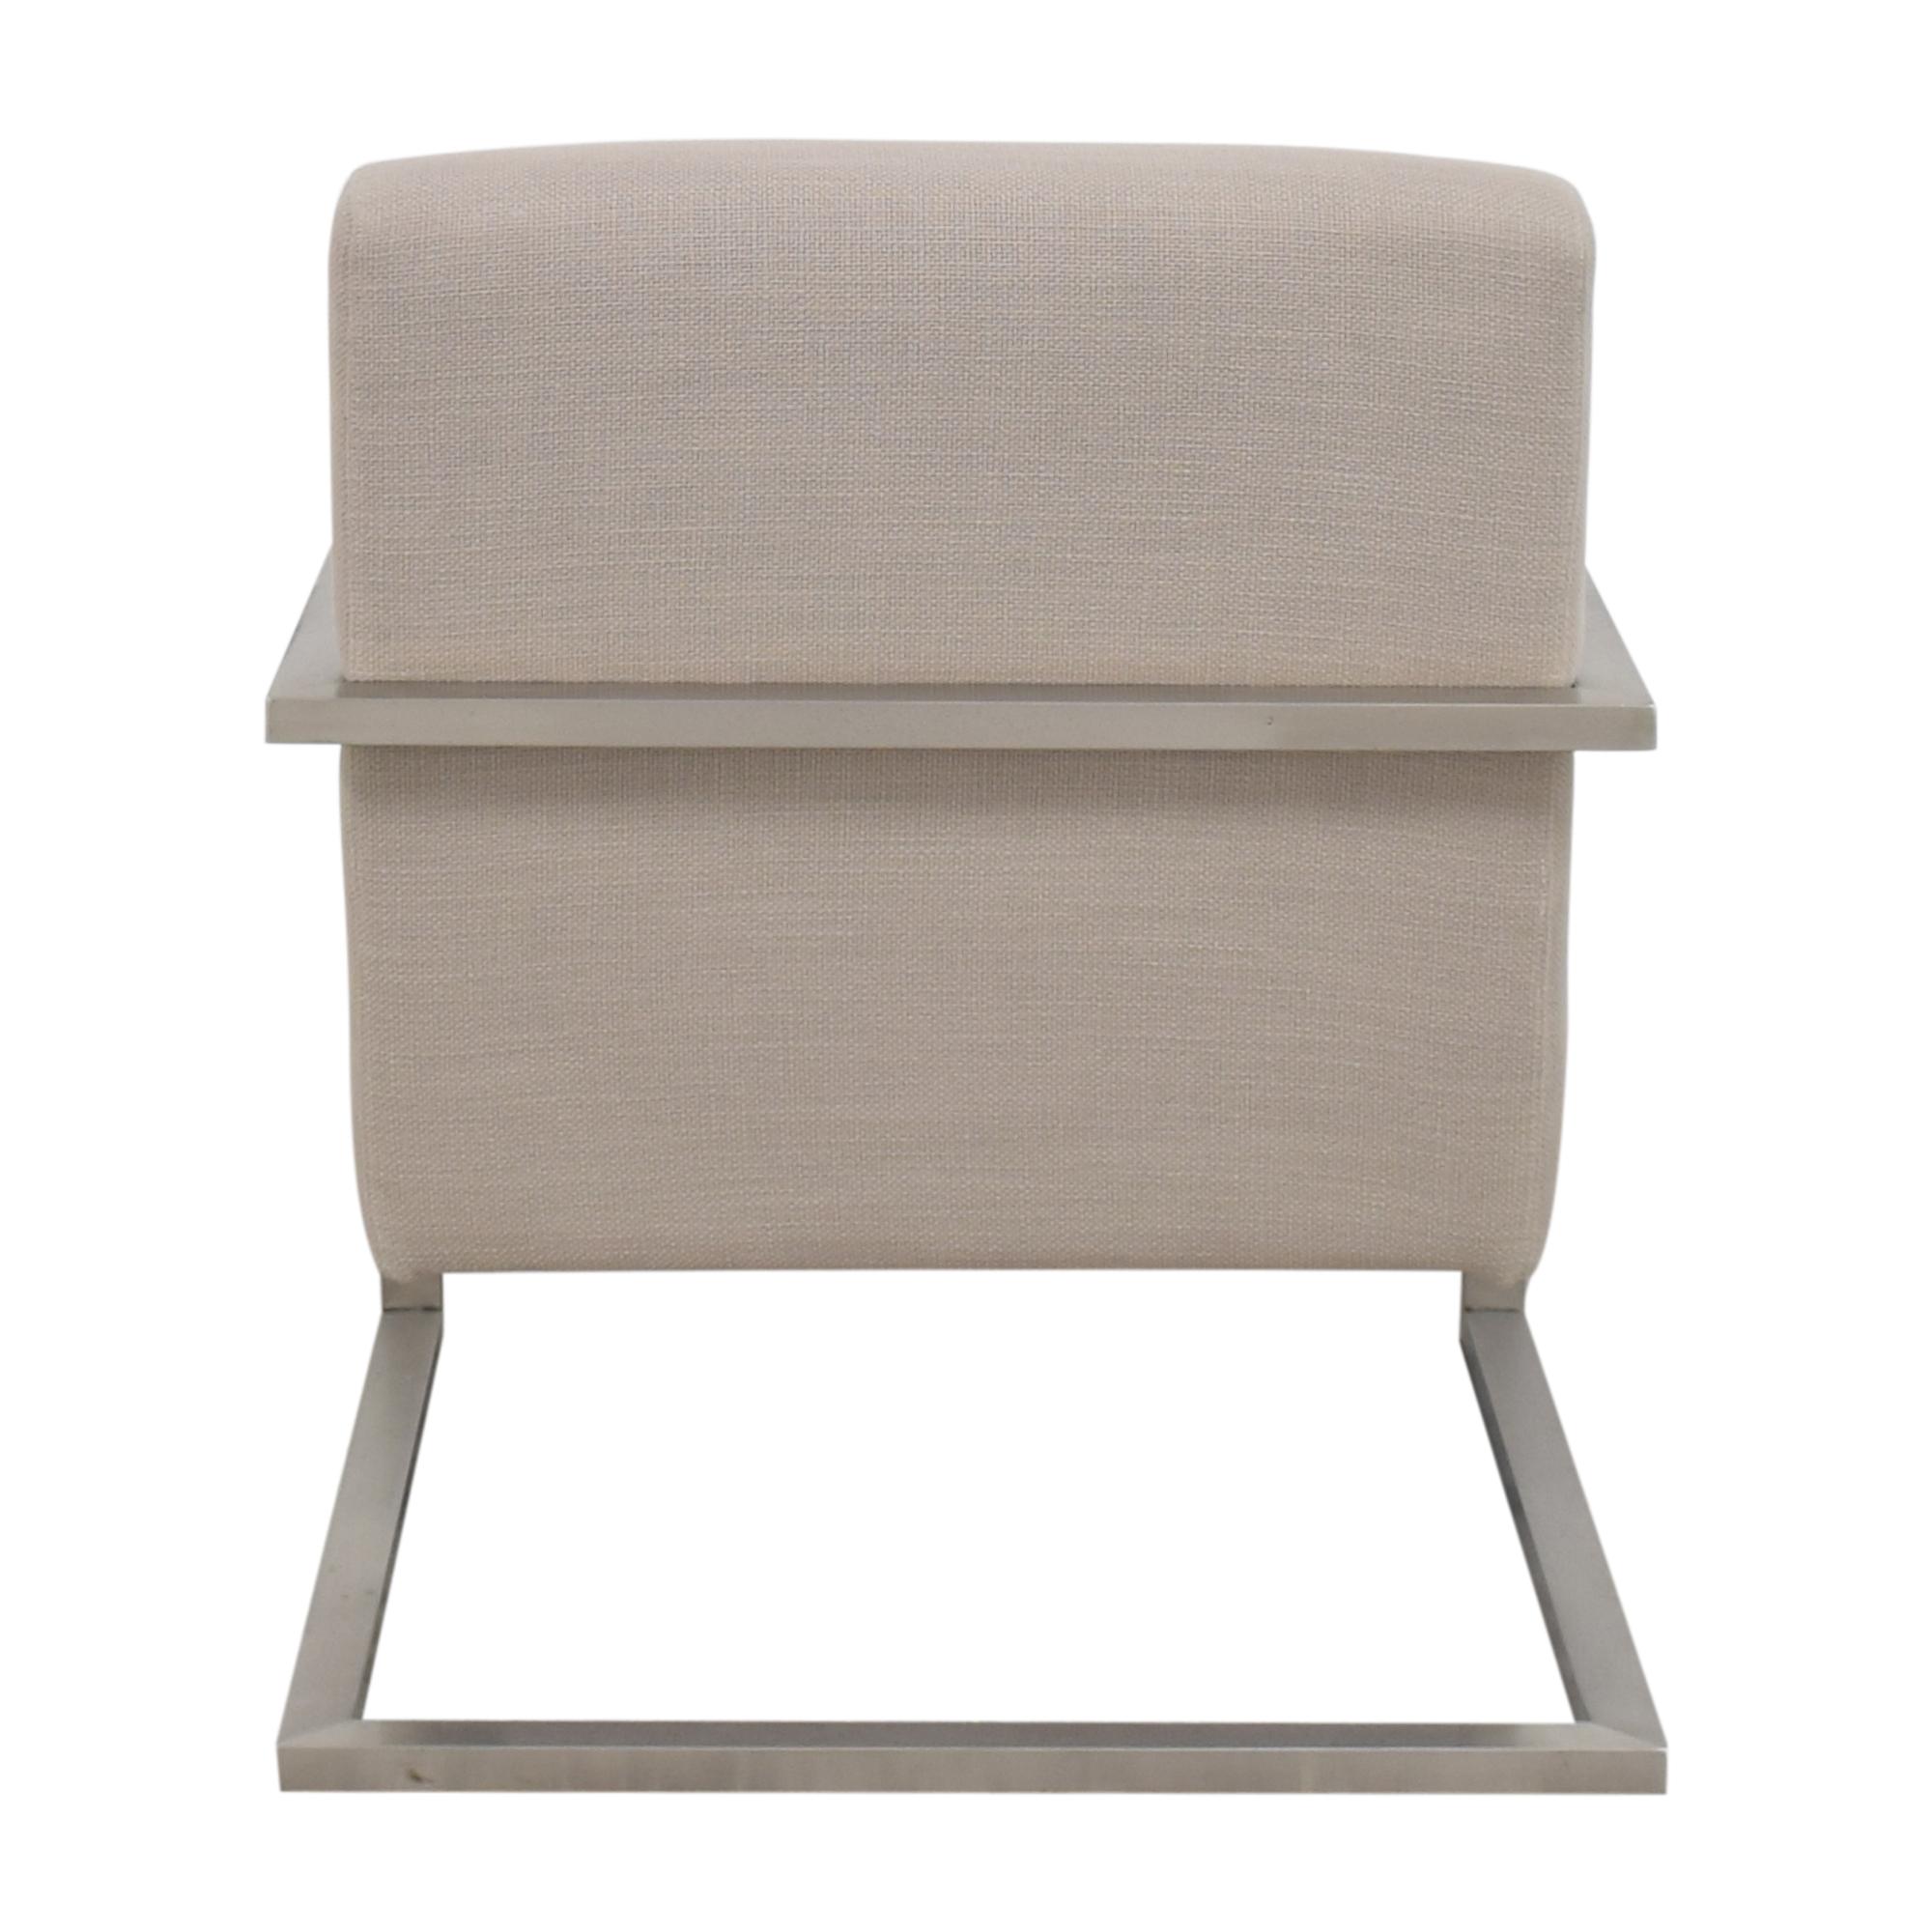 Armen Living Armen Living Skyline Accent Chair